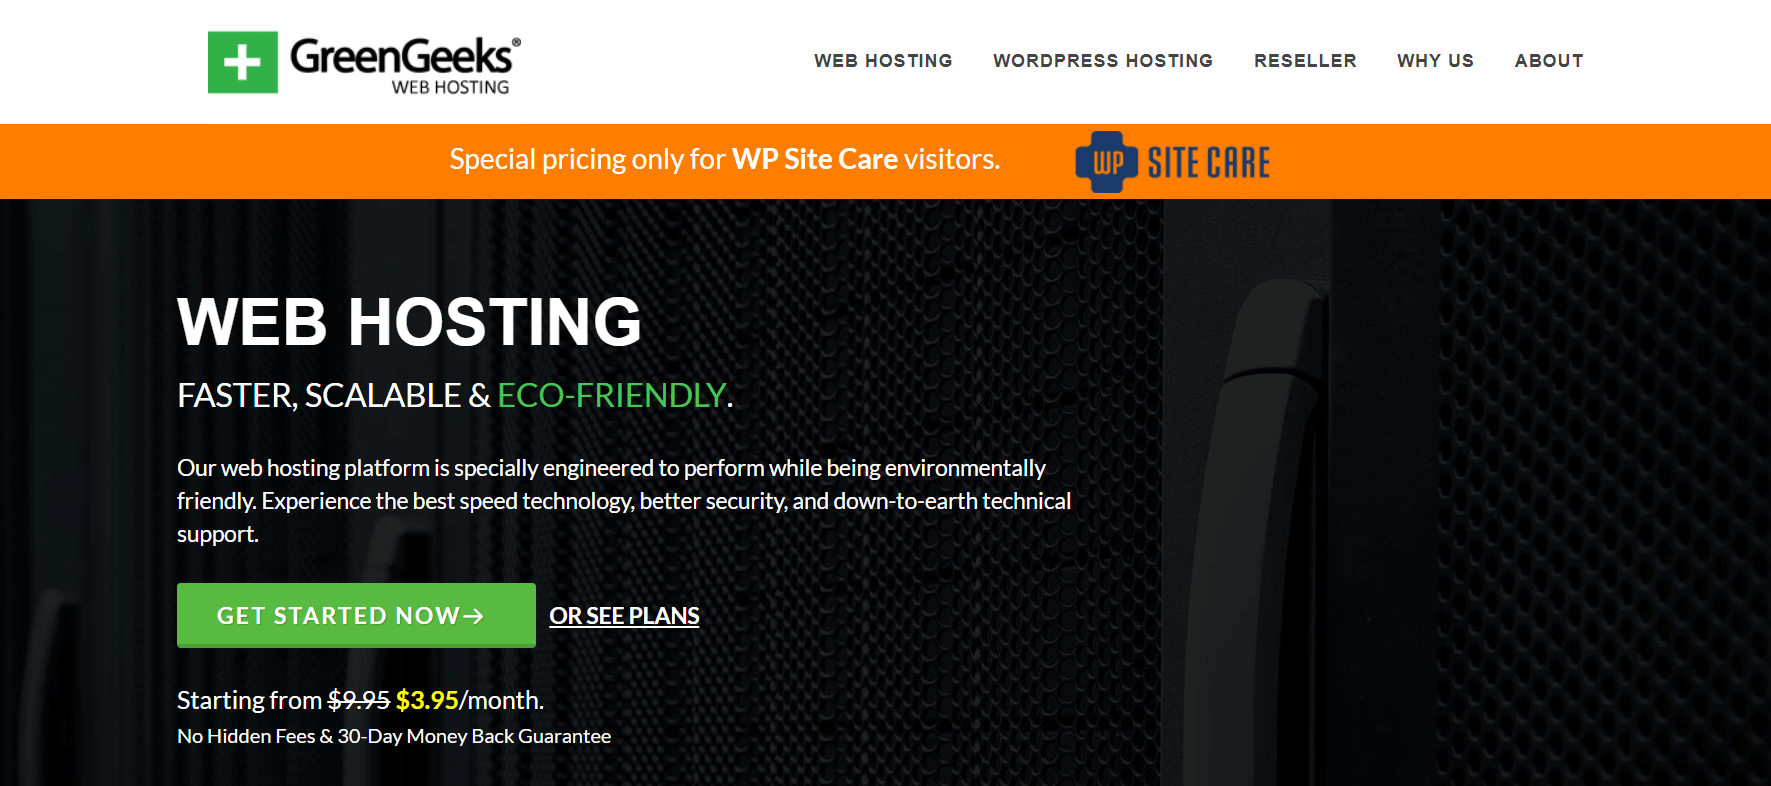 The GreenGeeks website home page.